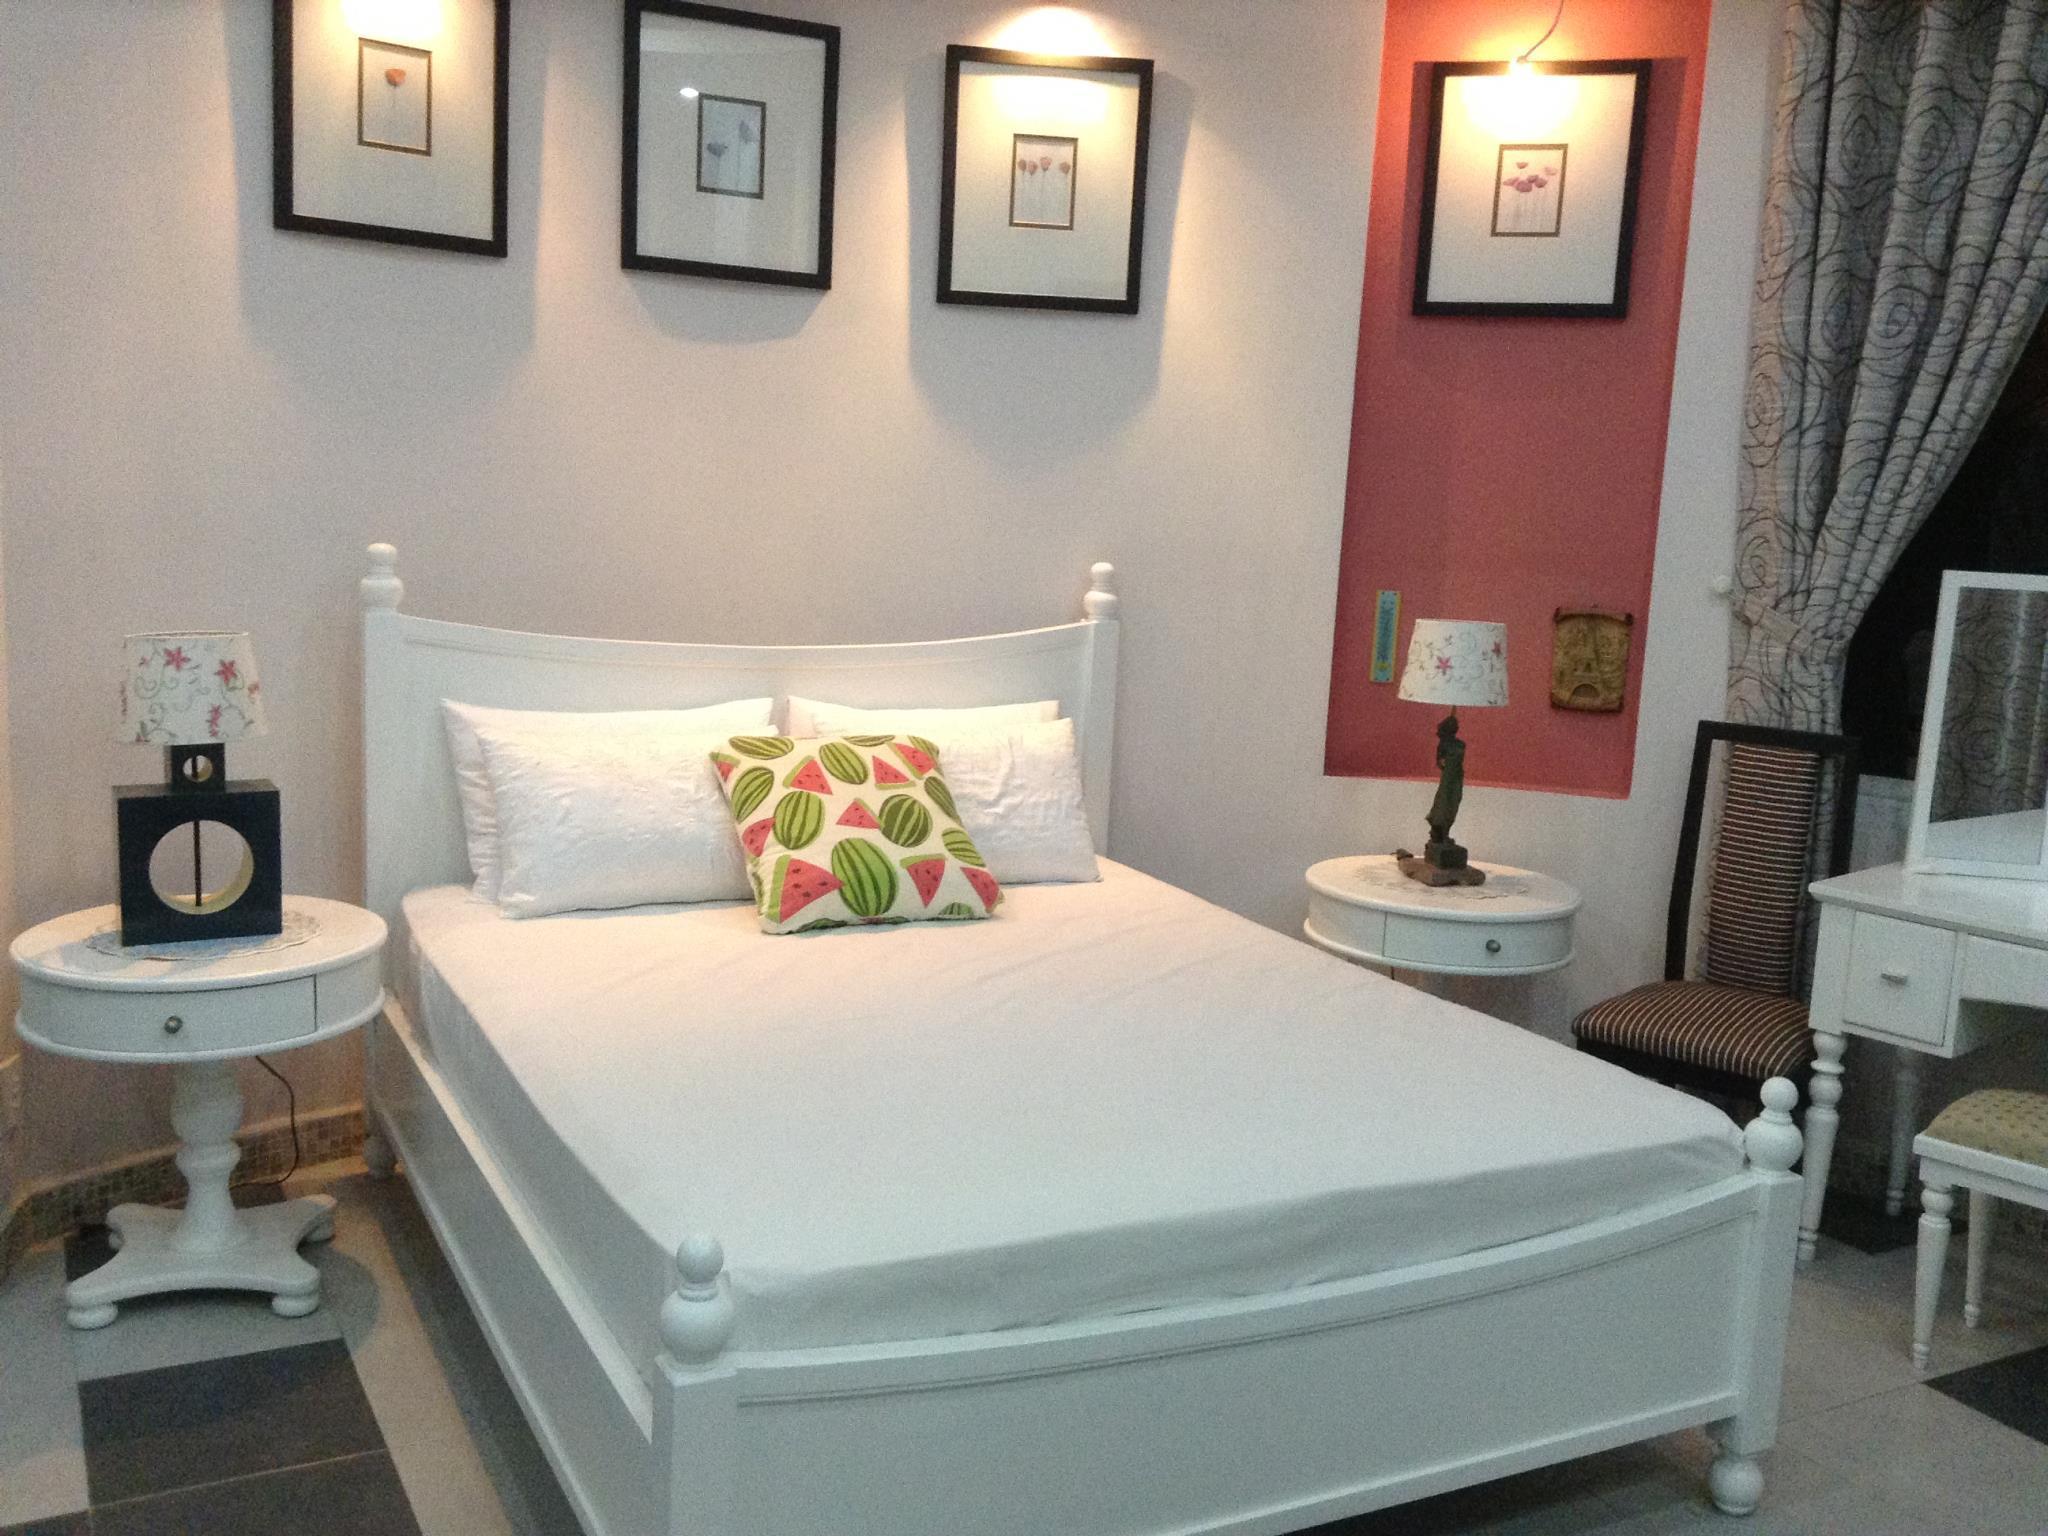 Das fish and tom bedrooms villa near my khe beach in da nang